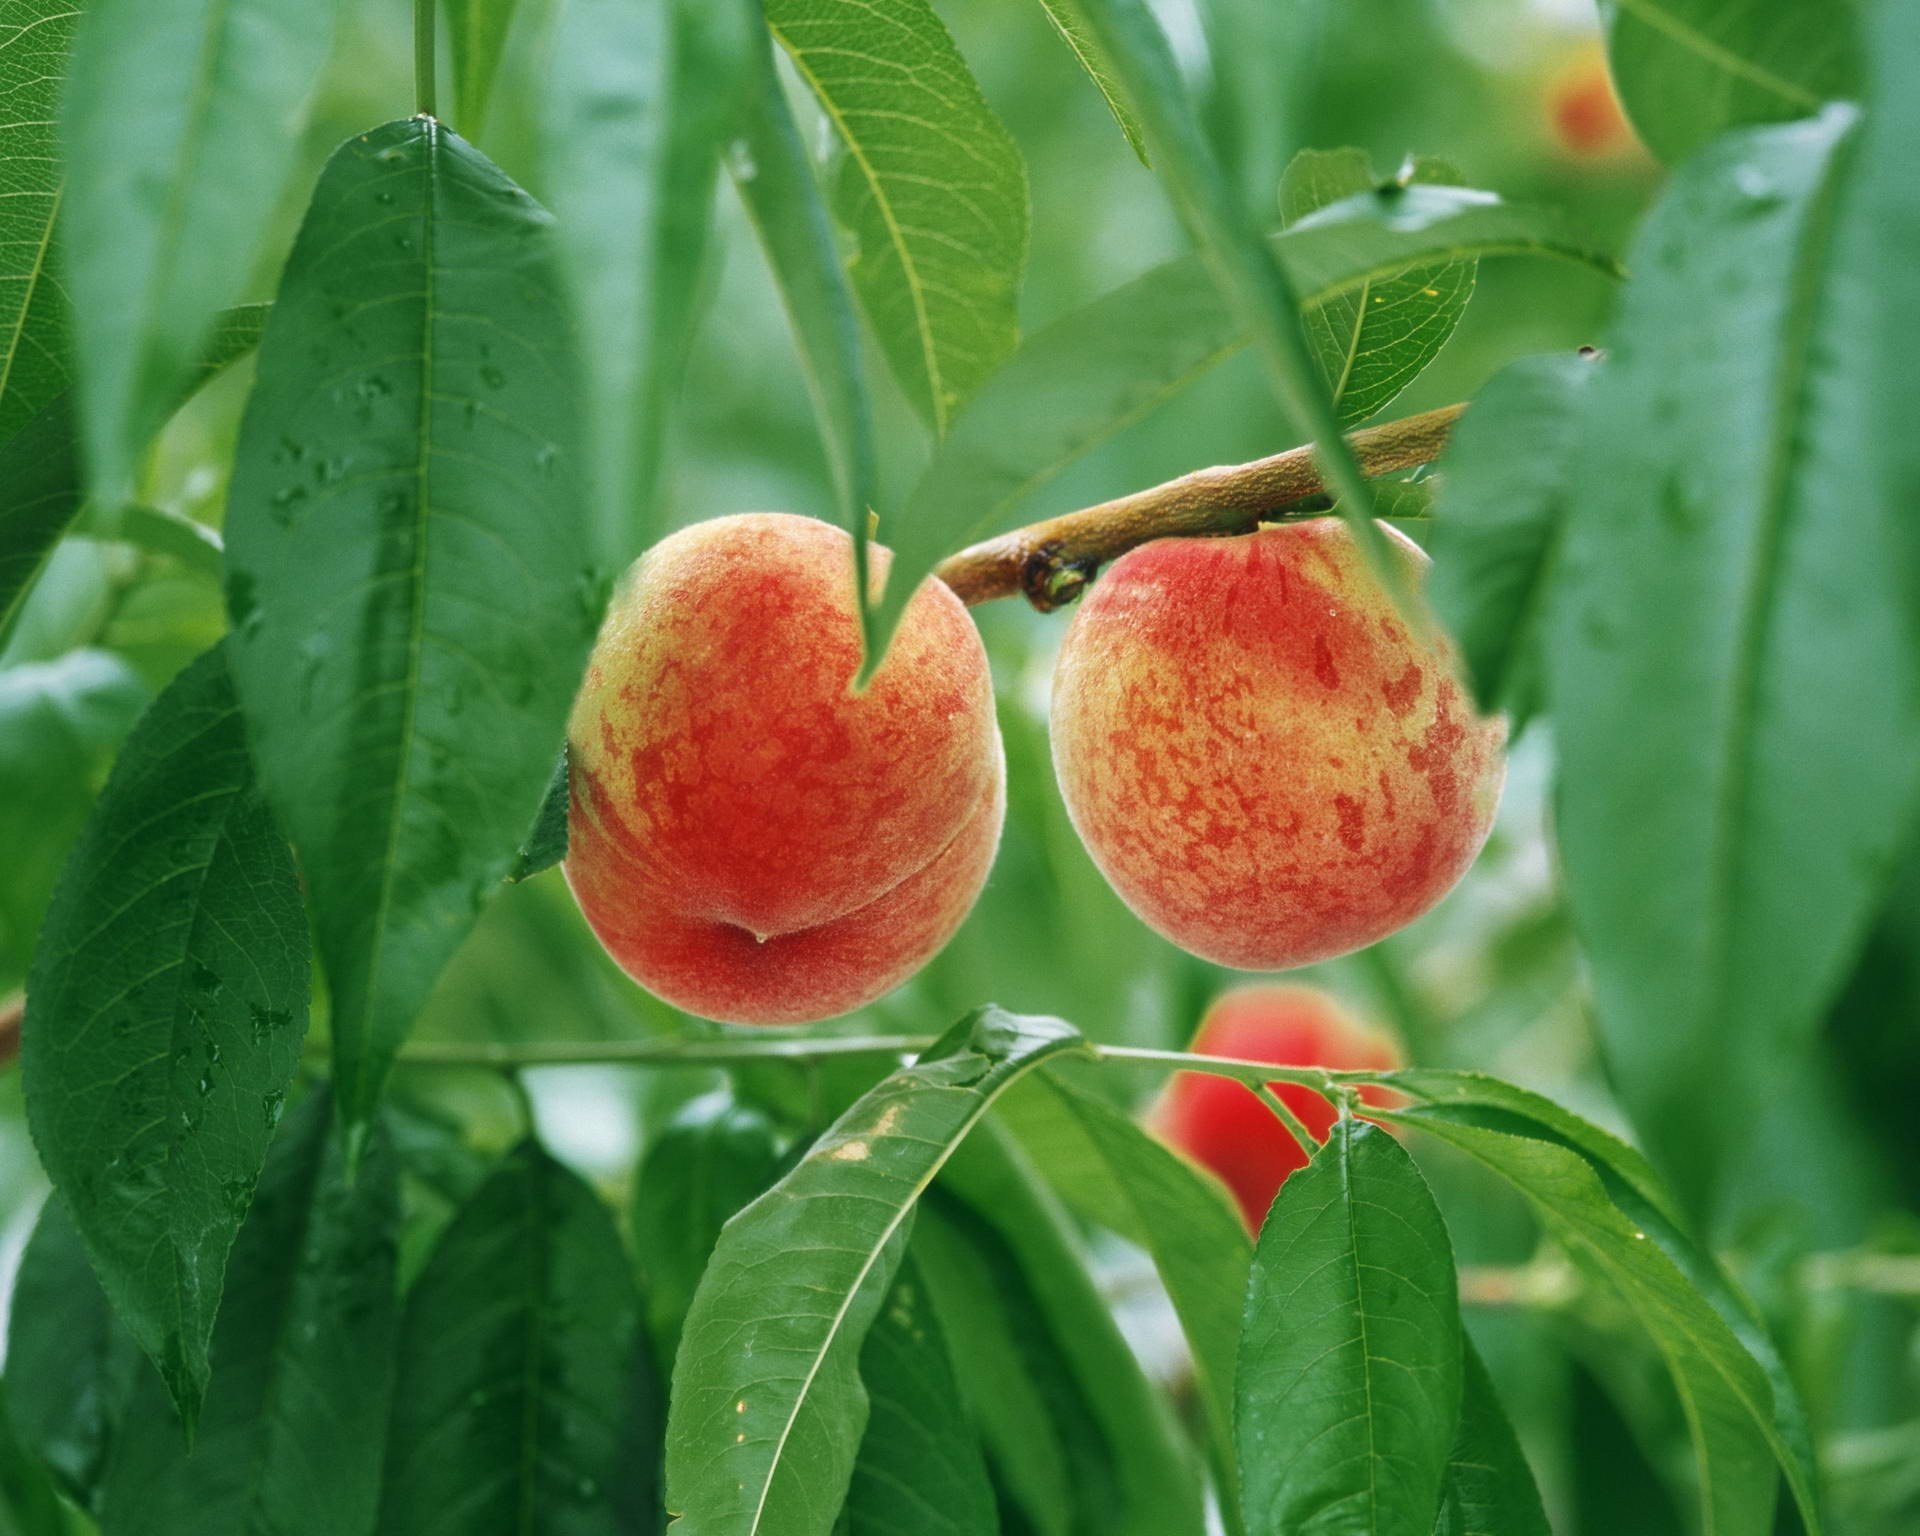 Chevron Iphone 5 Wallpaper Peach Background 183 ① Download Free Beautiful Full Hd